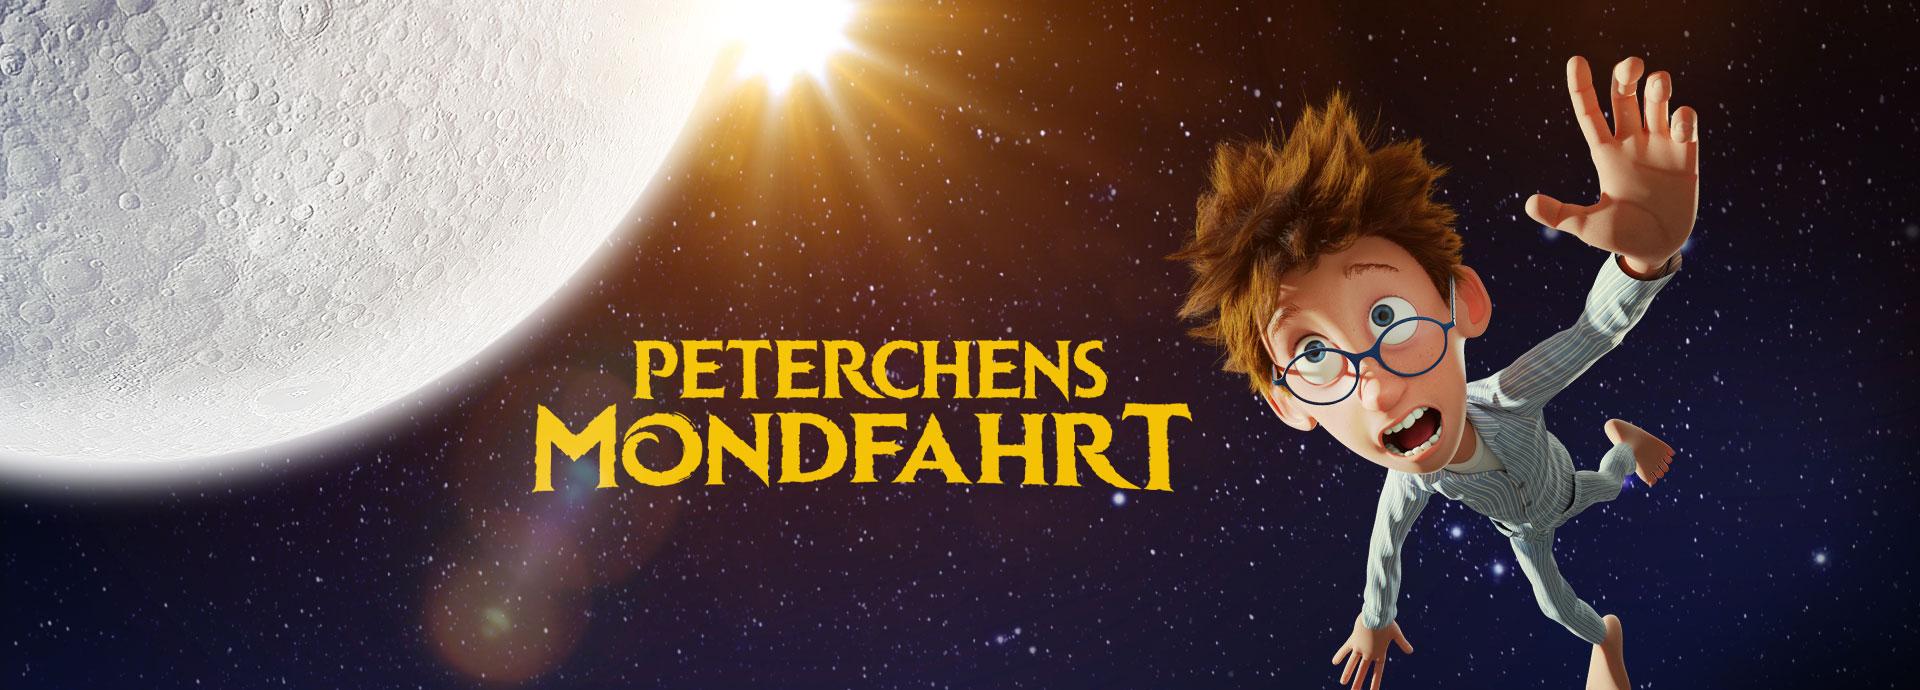 PeterchensMondfahrt-WEB0